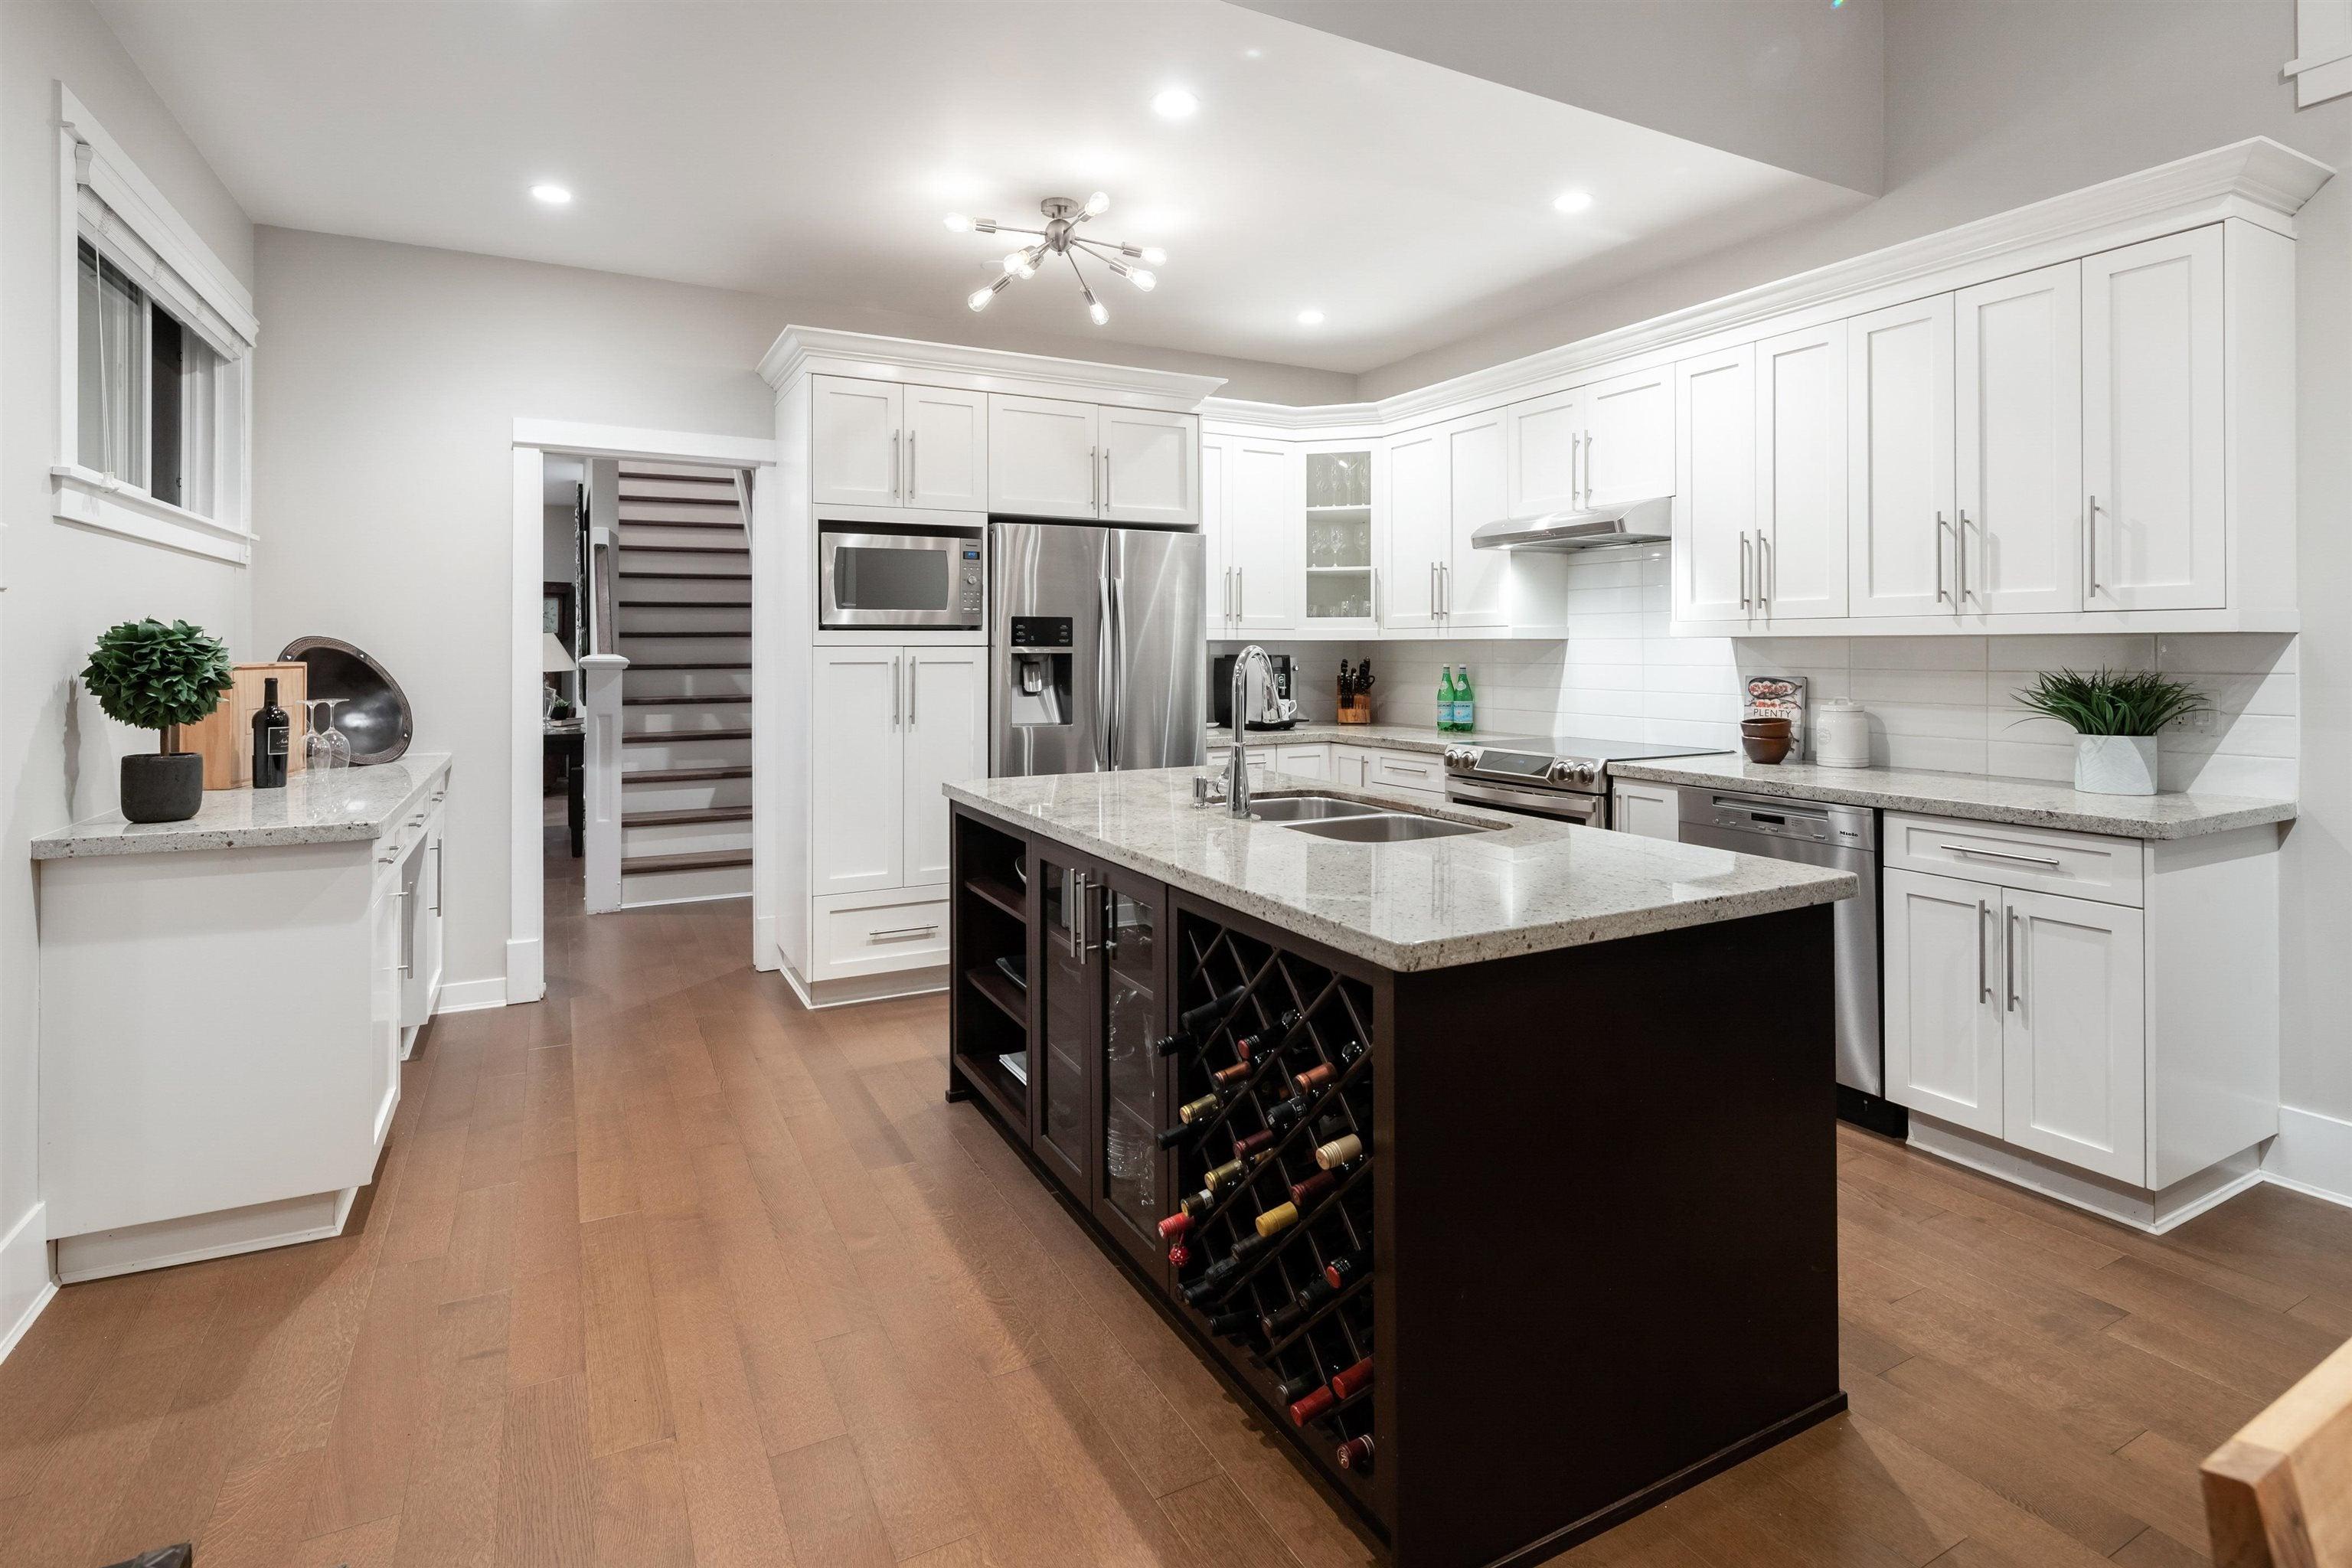 2258 WINDRIDGE DRIVE - Seymour NV House/Single Family for sale, 5 Bedrooms (R2617156) - #4